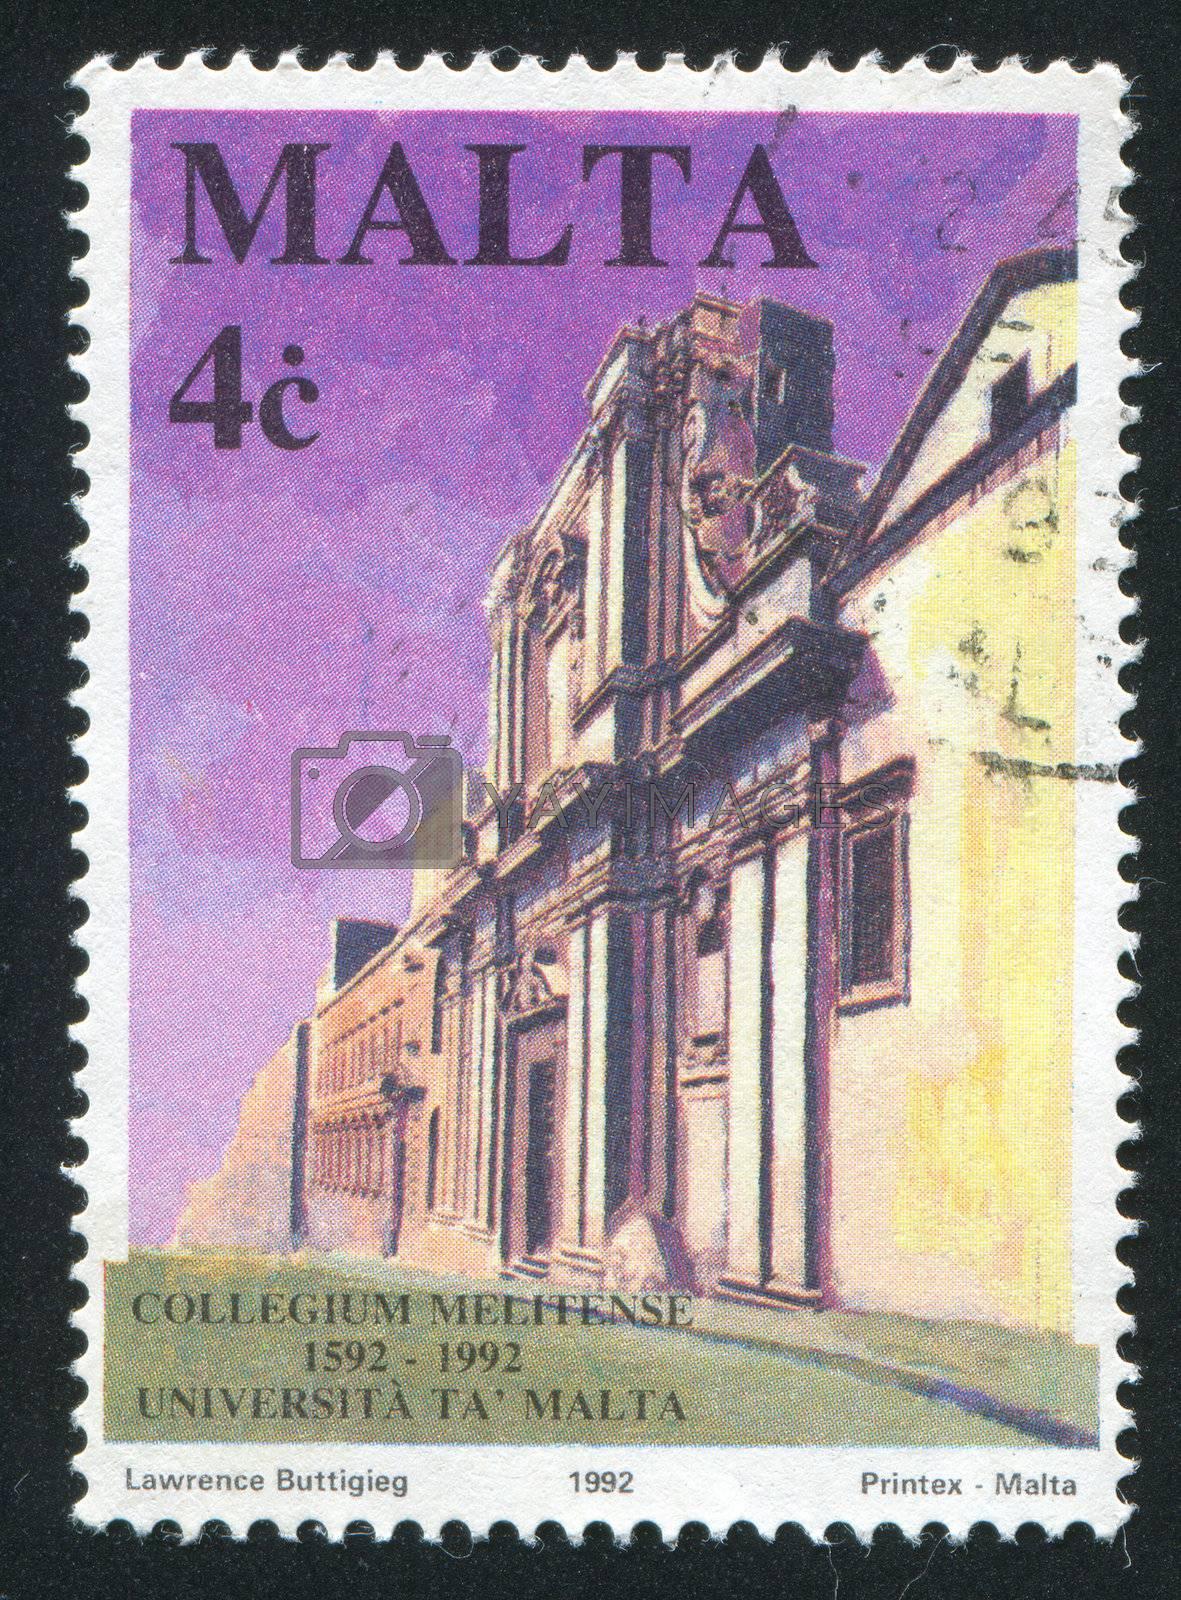 MALTA - CIRCA 1992: stamp printed by Malta, shows University of Malta, circa 1992